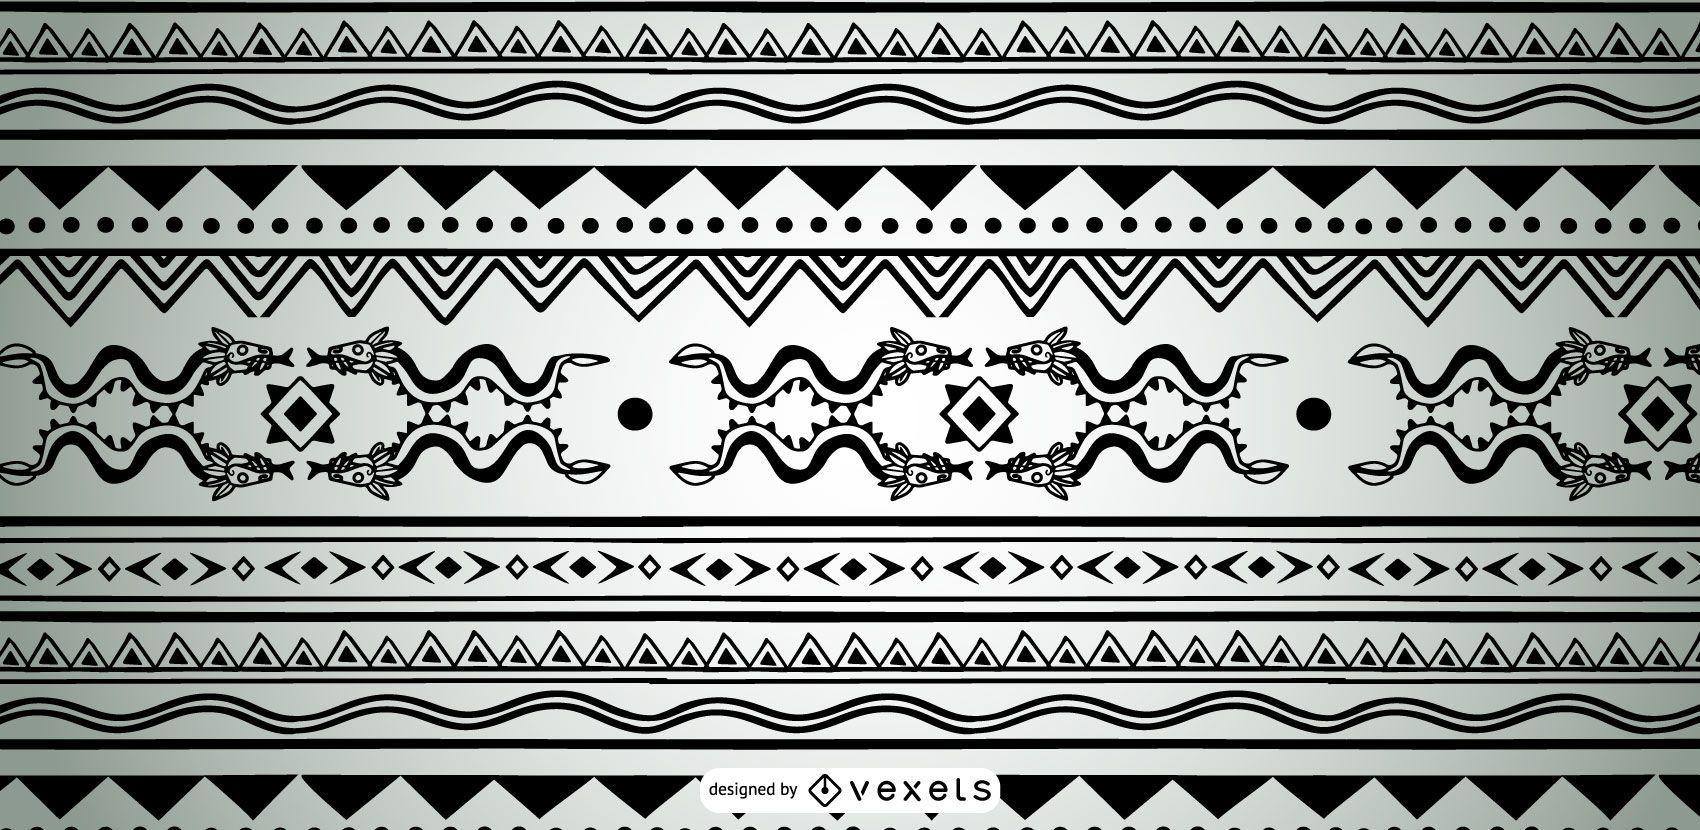 Monochrome Aztec Pattern Design